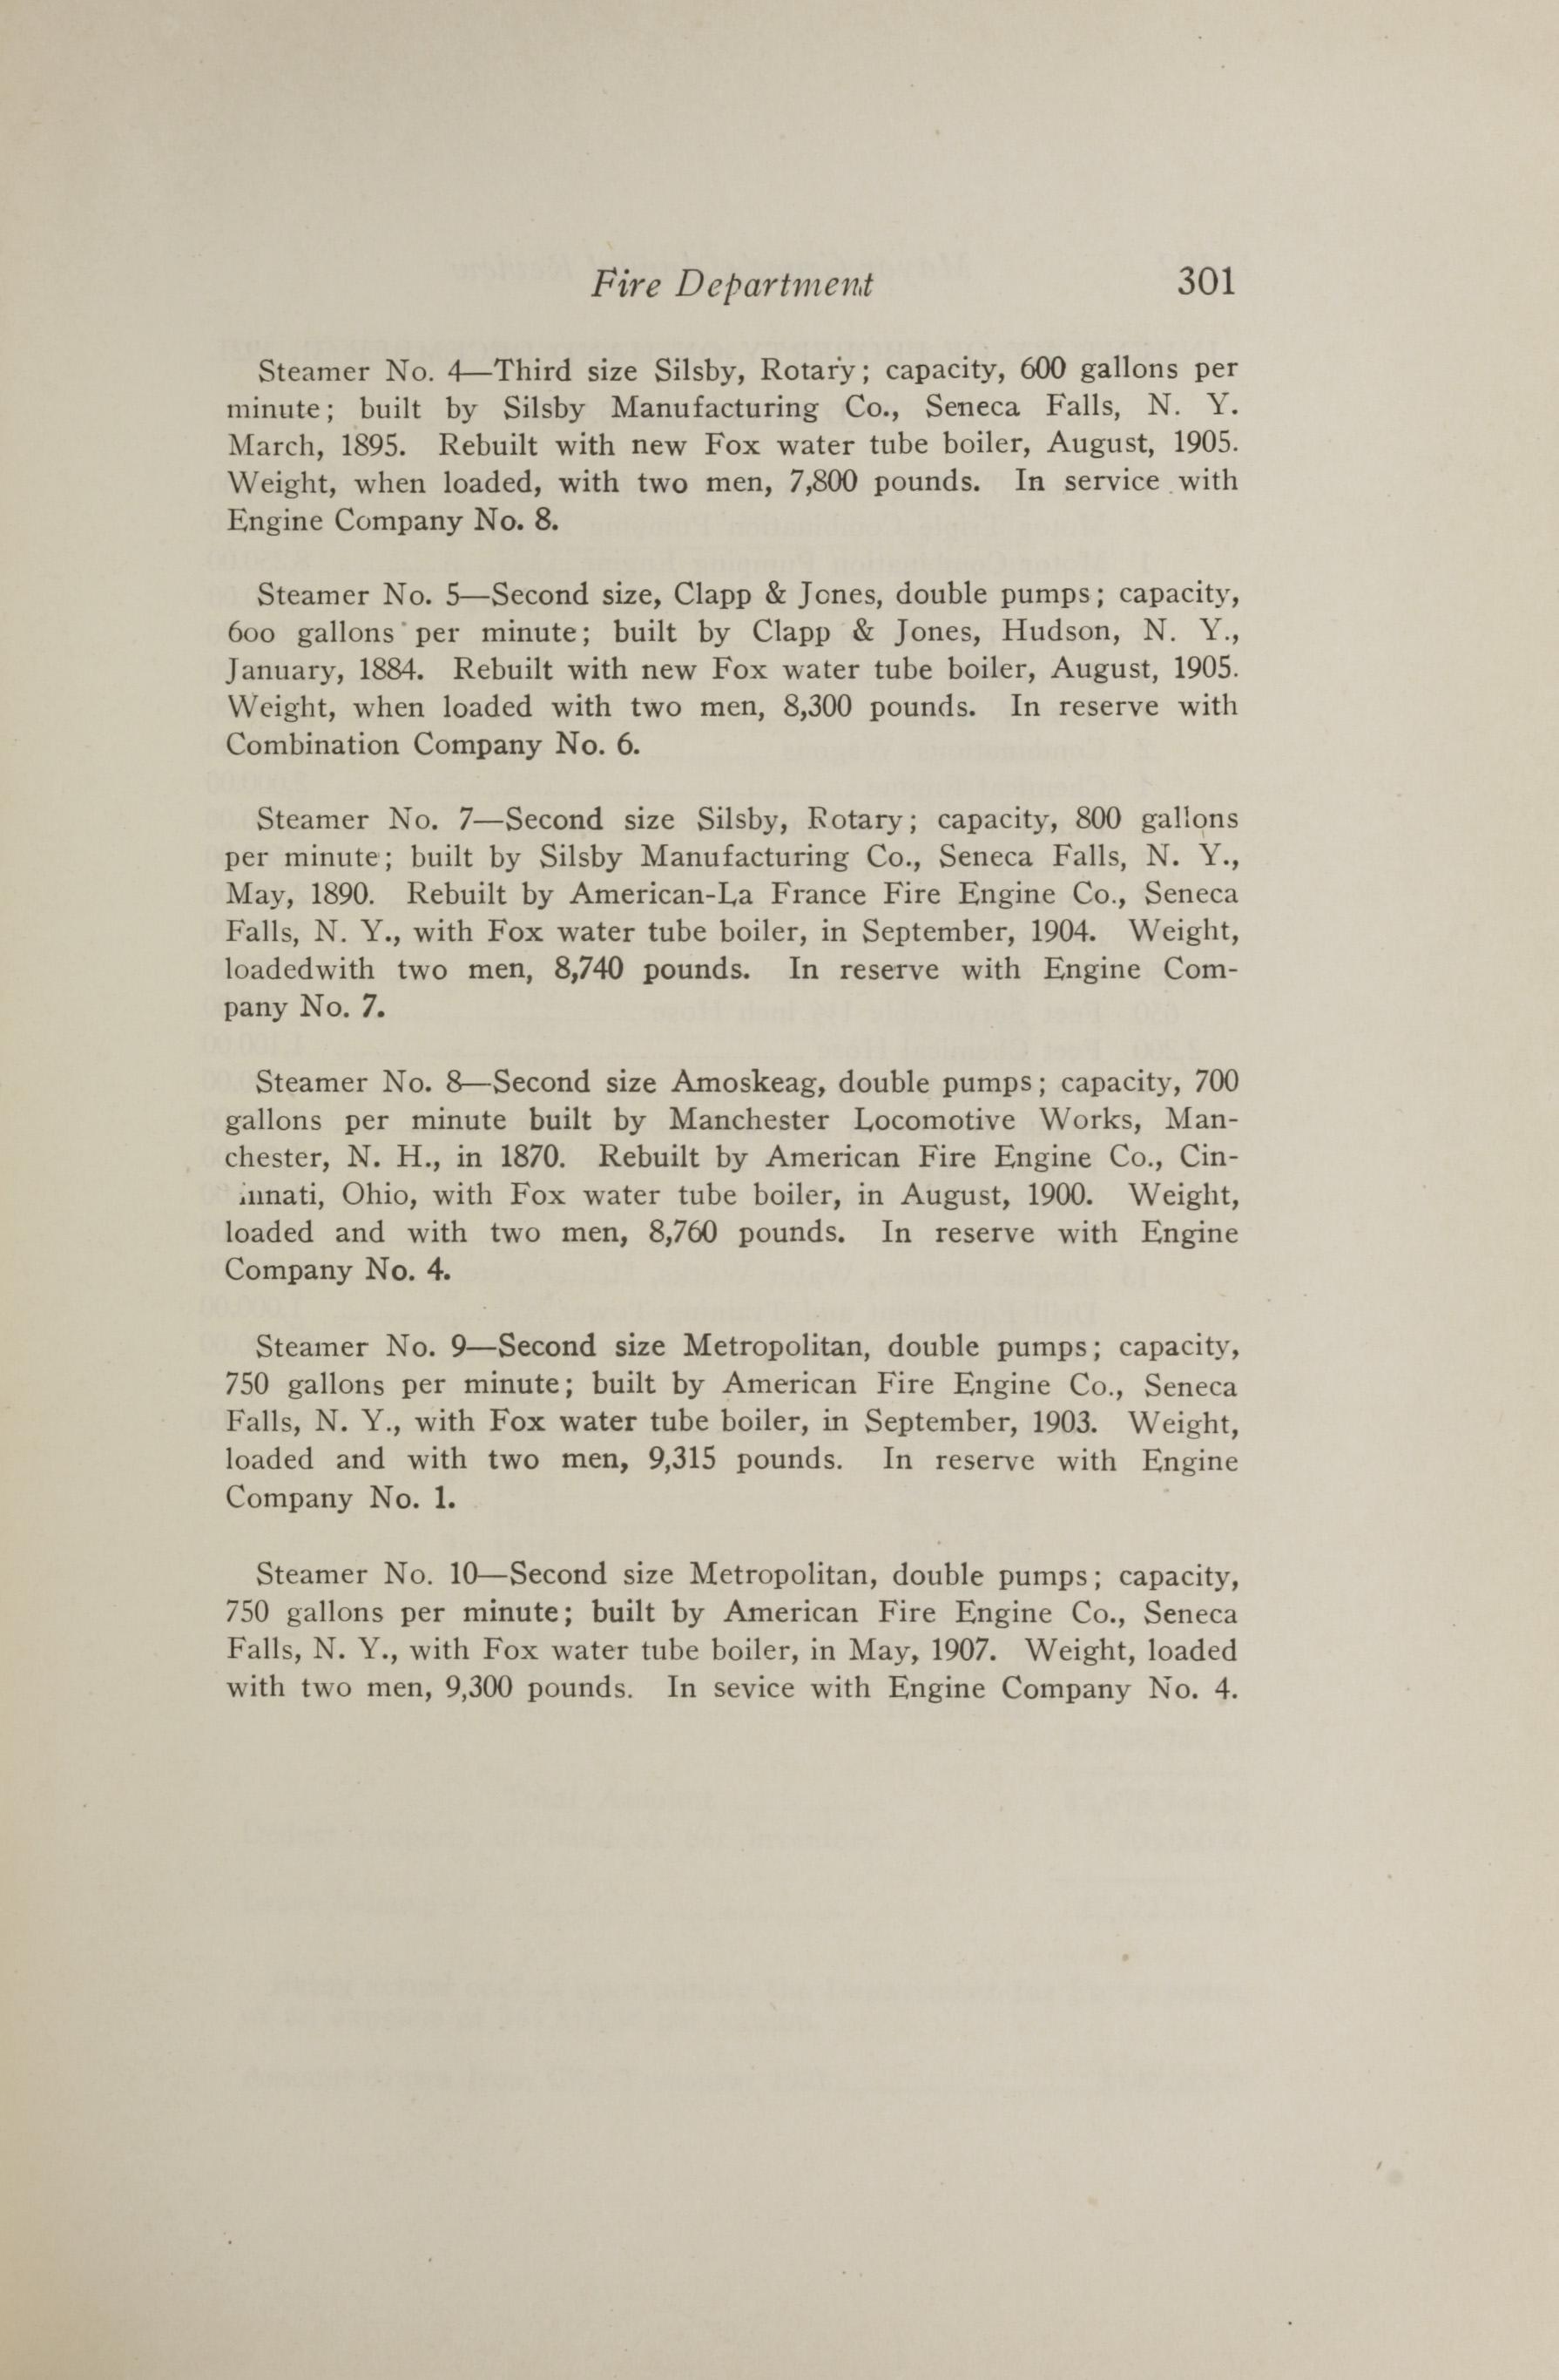 Charleston Yearbook, 1921, page 301